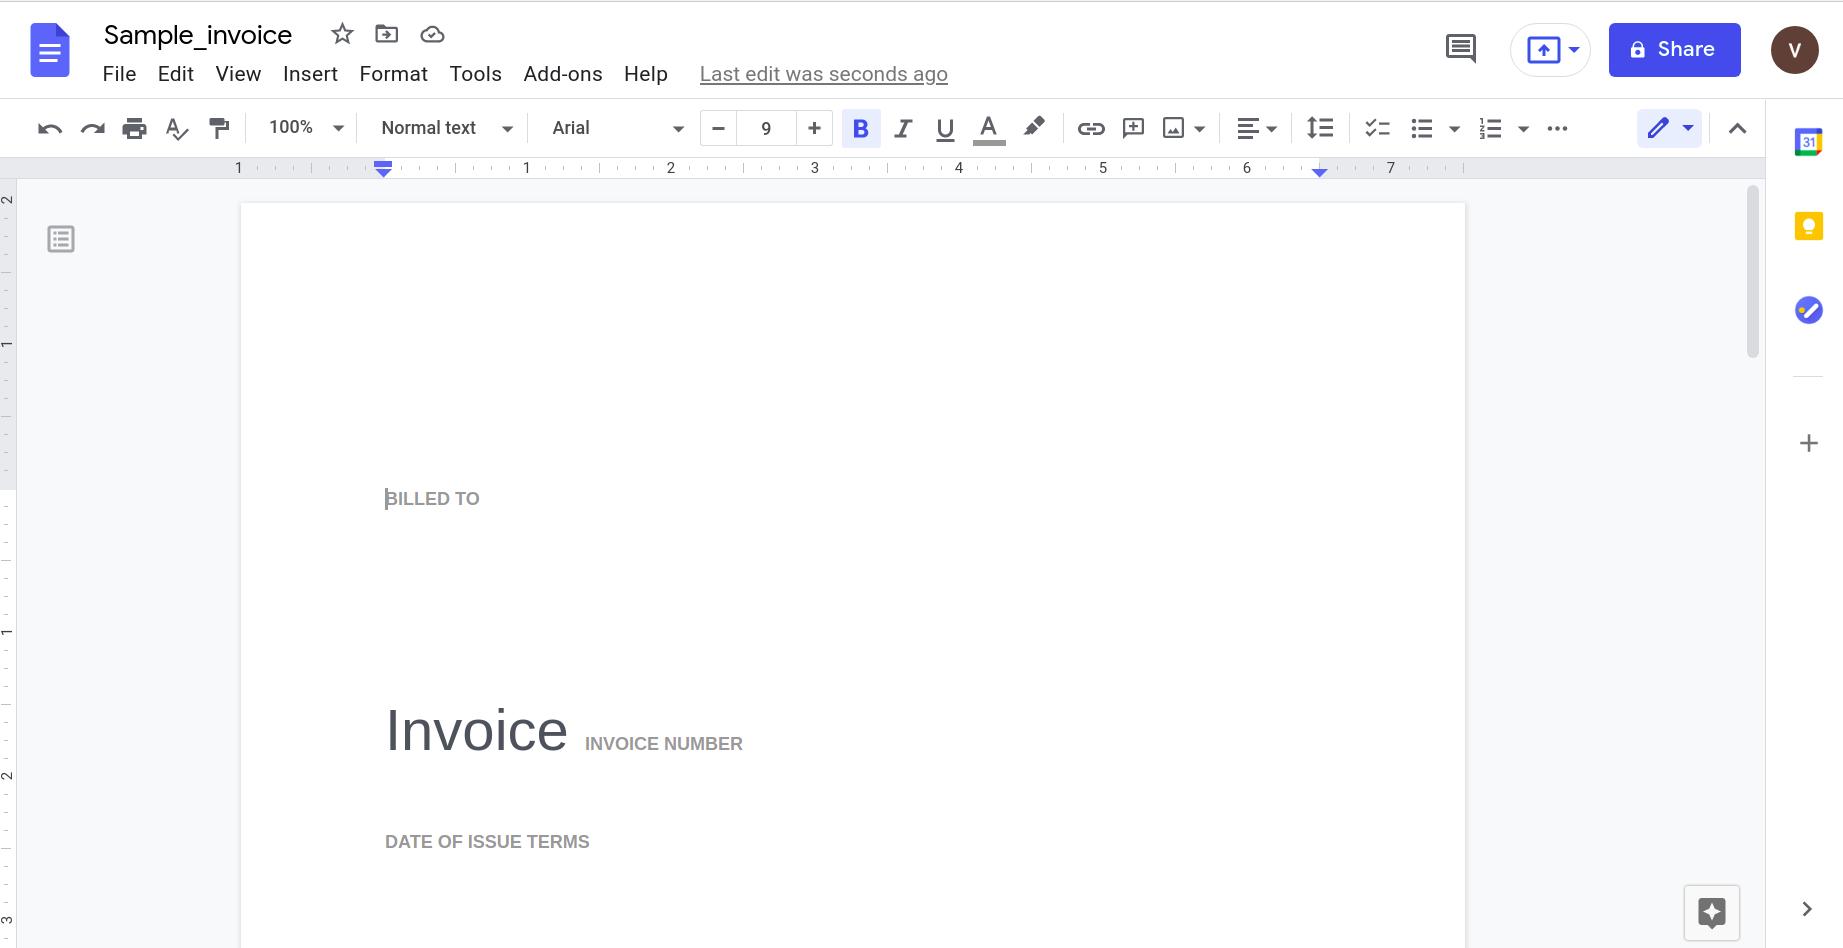 Sample_invoice_txt_drivemethod